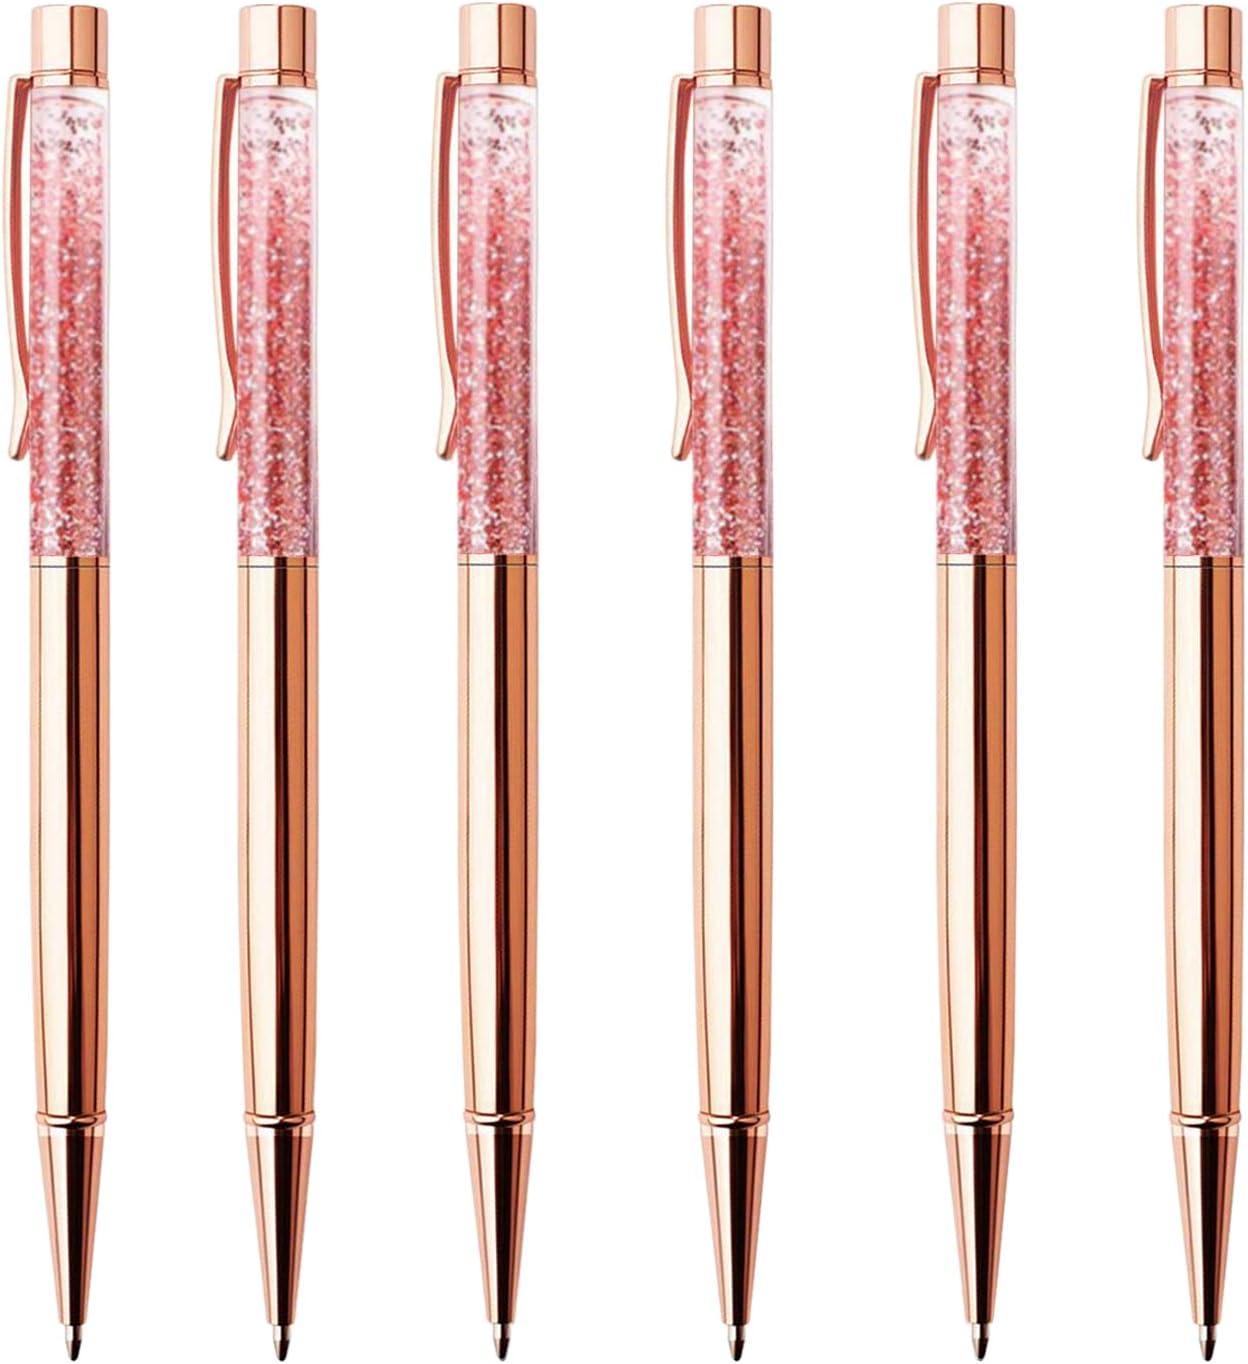 Herisa 6 Pcs Rose Gold Ballpoint Pens,Metal Pen Refills Bling Dynamic Liquid Sand Pen Office Supplies and School Desk Accessories,6Extra Refills